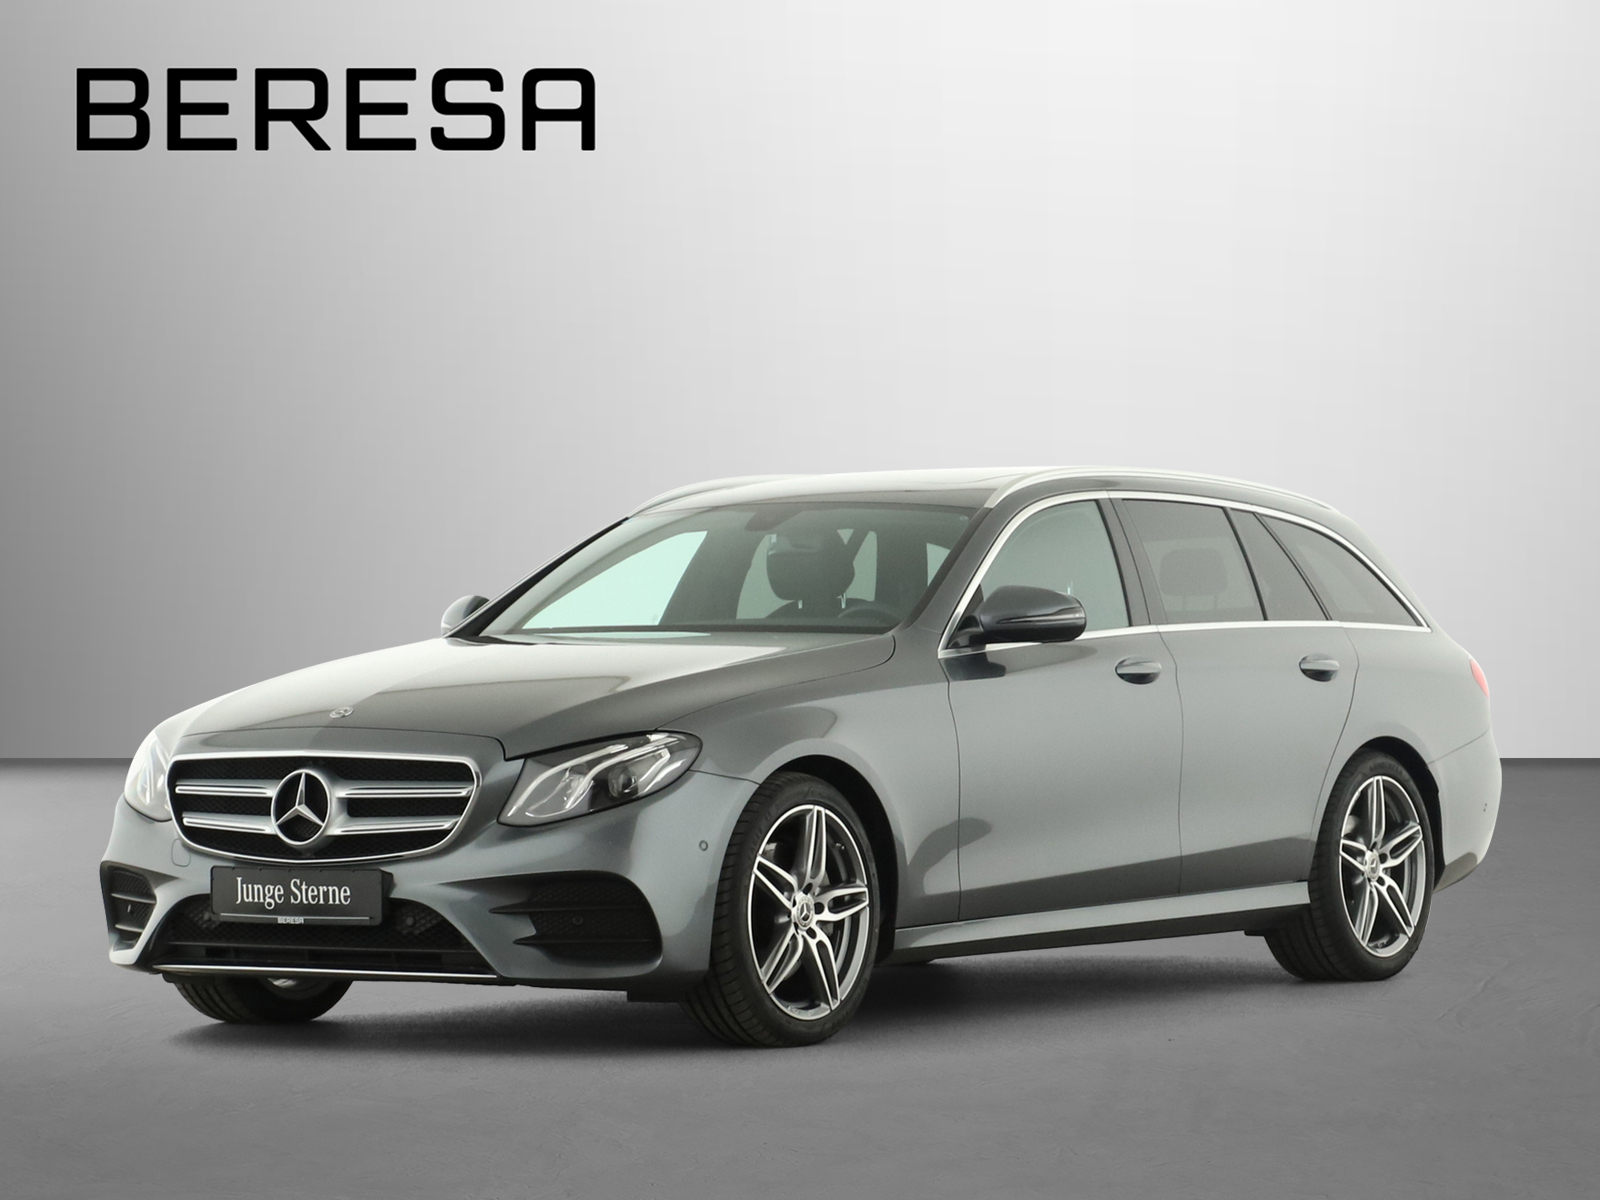 Mercedes-Benz E 300 d T AMG LED AHK Kamera Navi Schiebedach, Jahr 2020, Diesel